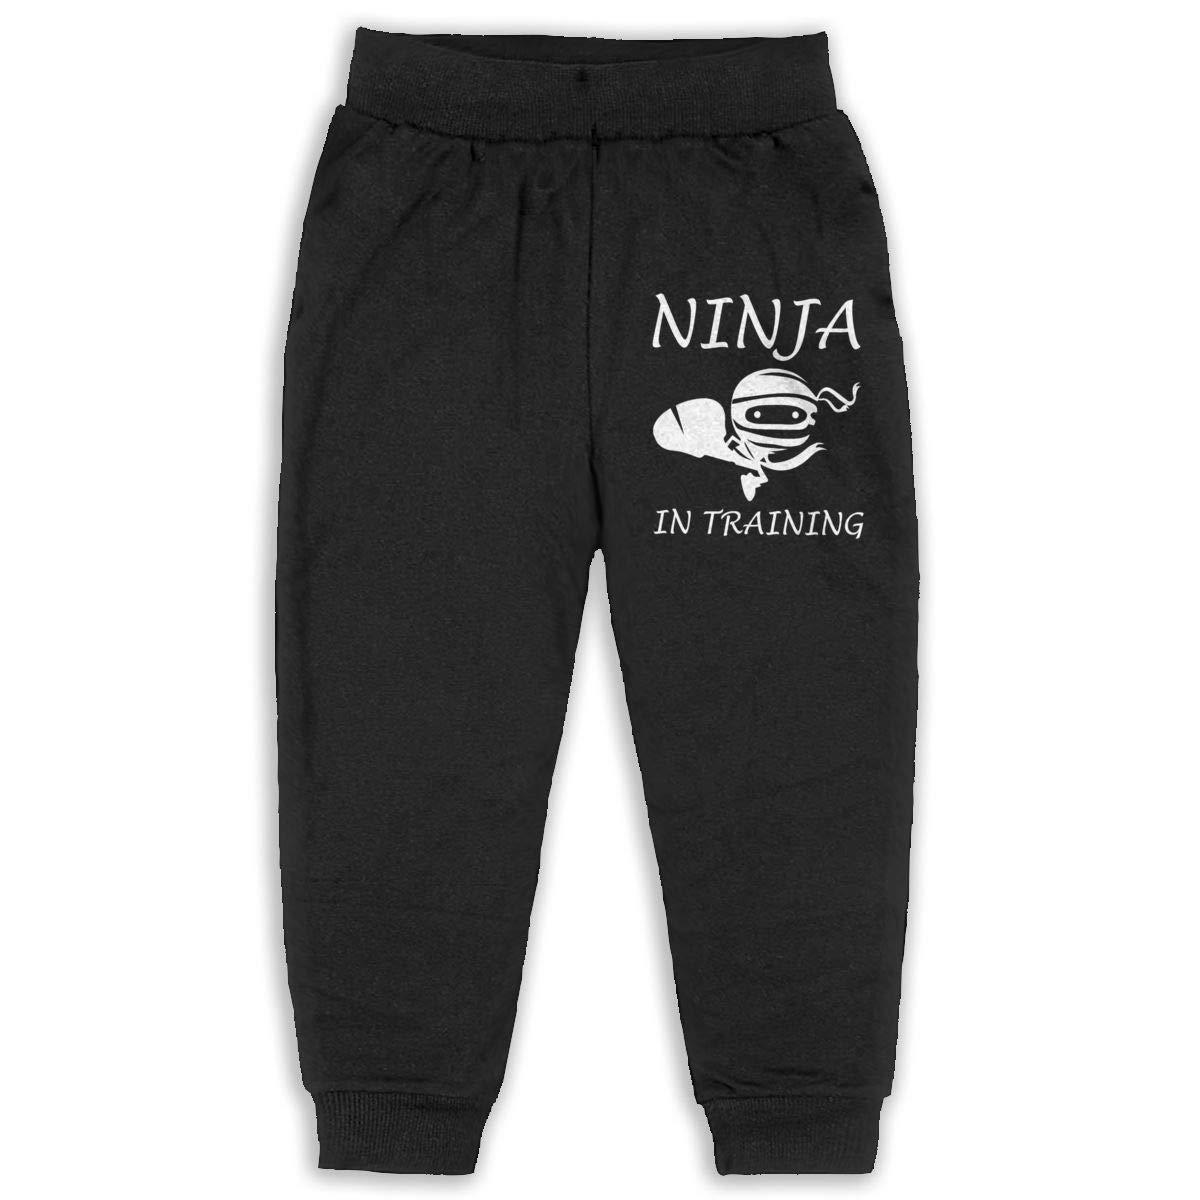 Ninja in Training 2-6T Boys Active Joggers Soft Pant